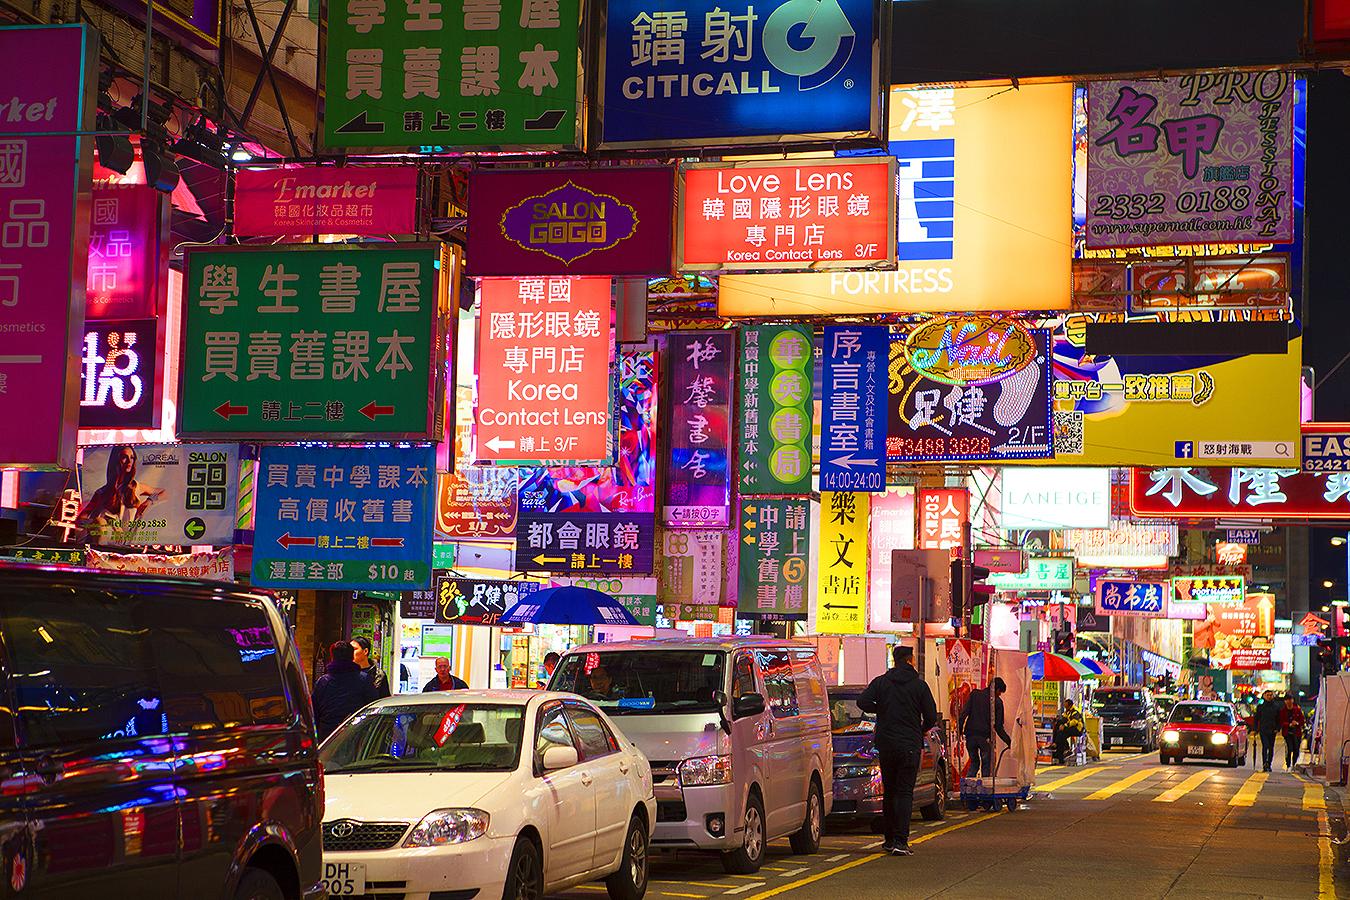 Alice_Qiu_Big_Signs_Hong_Kong_advertising_night_neon_lights